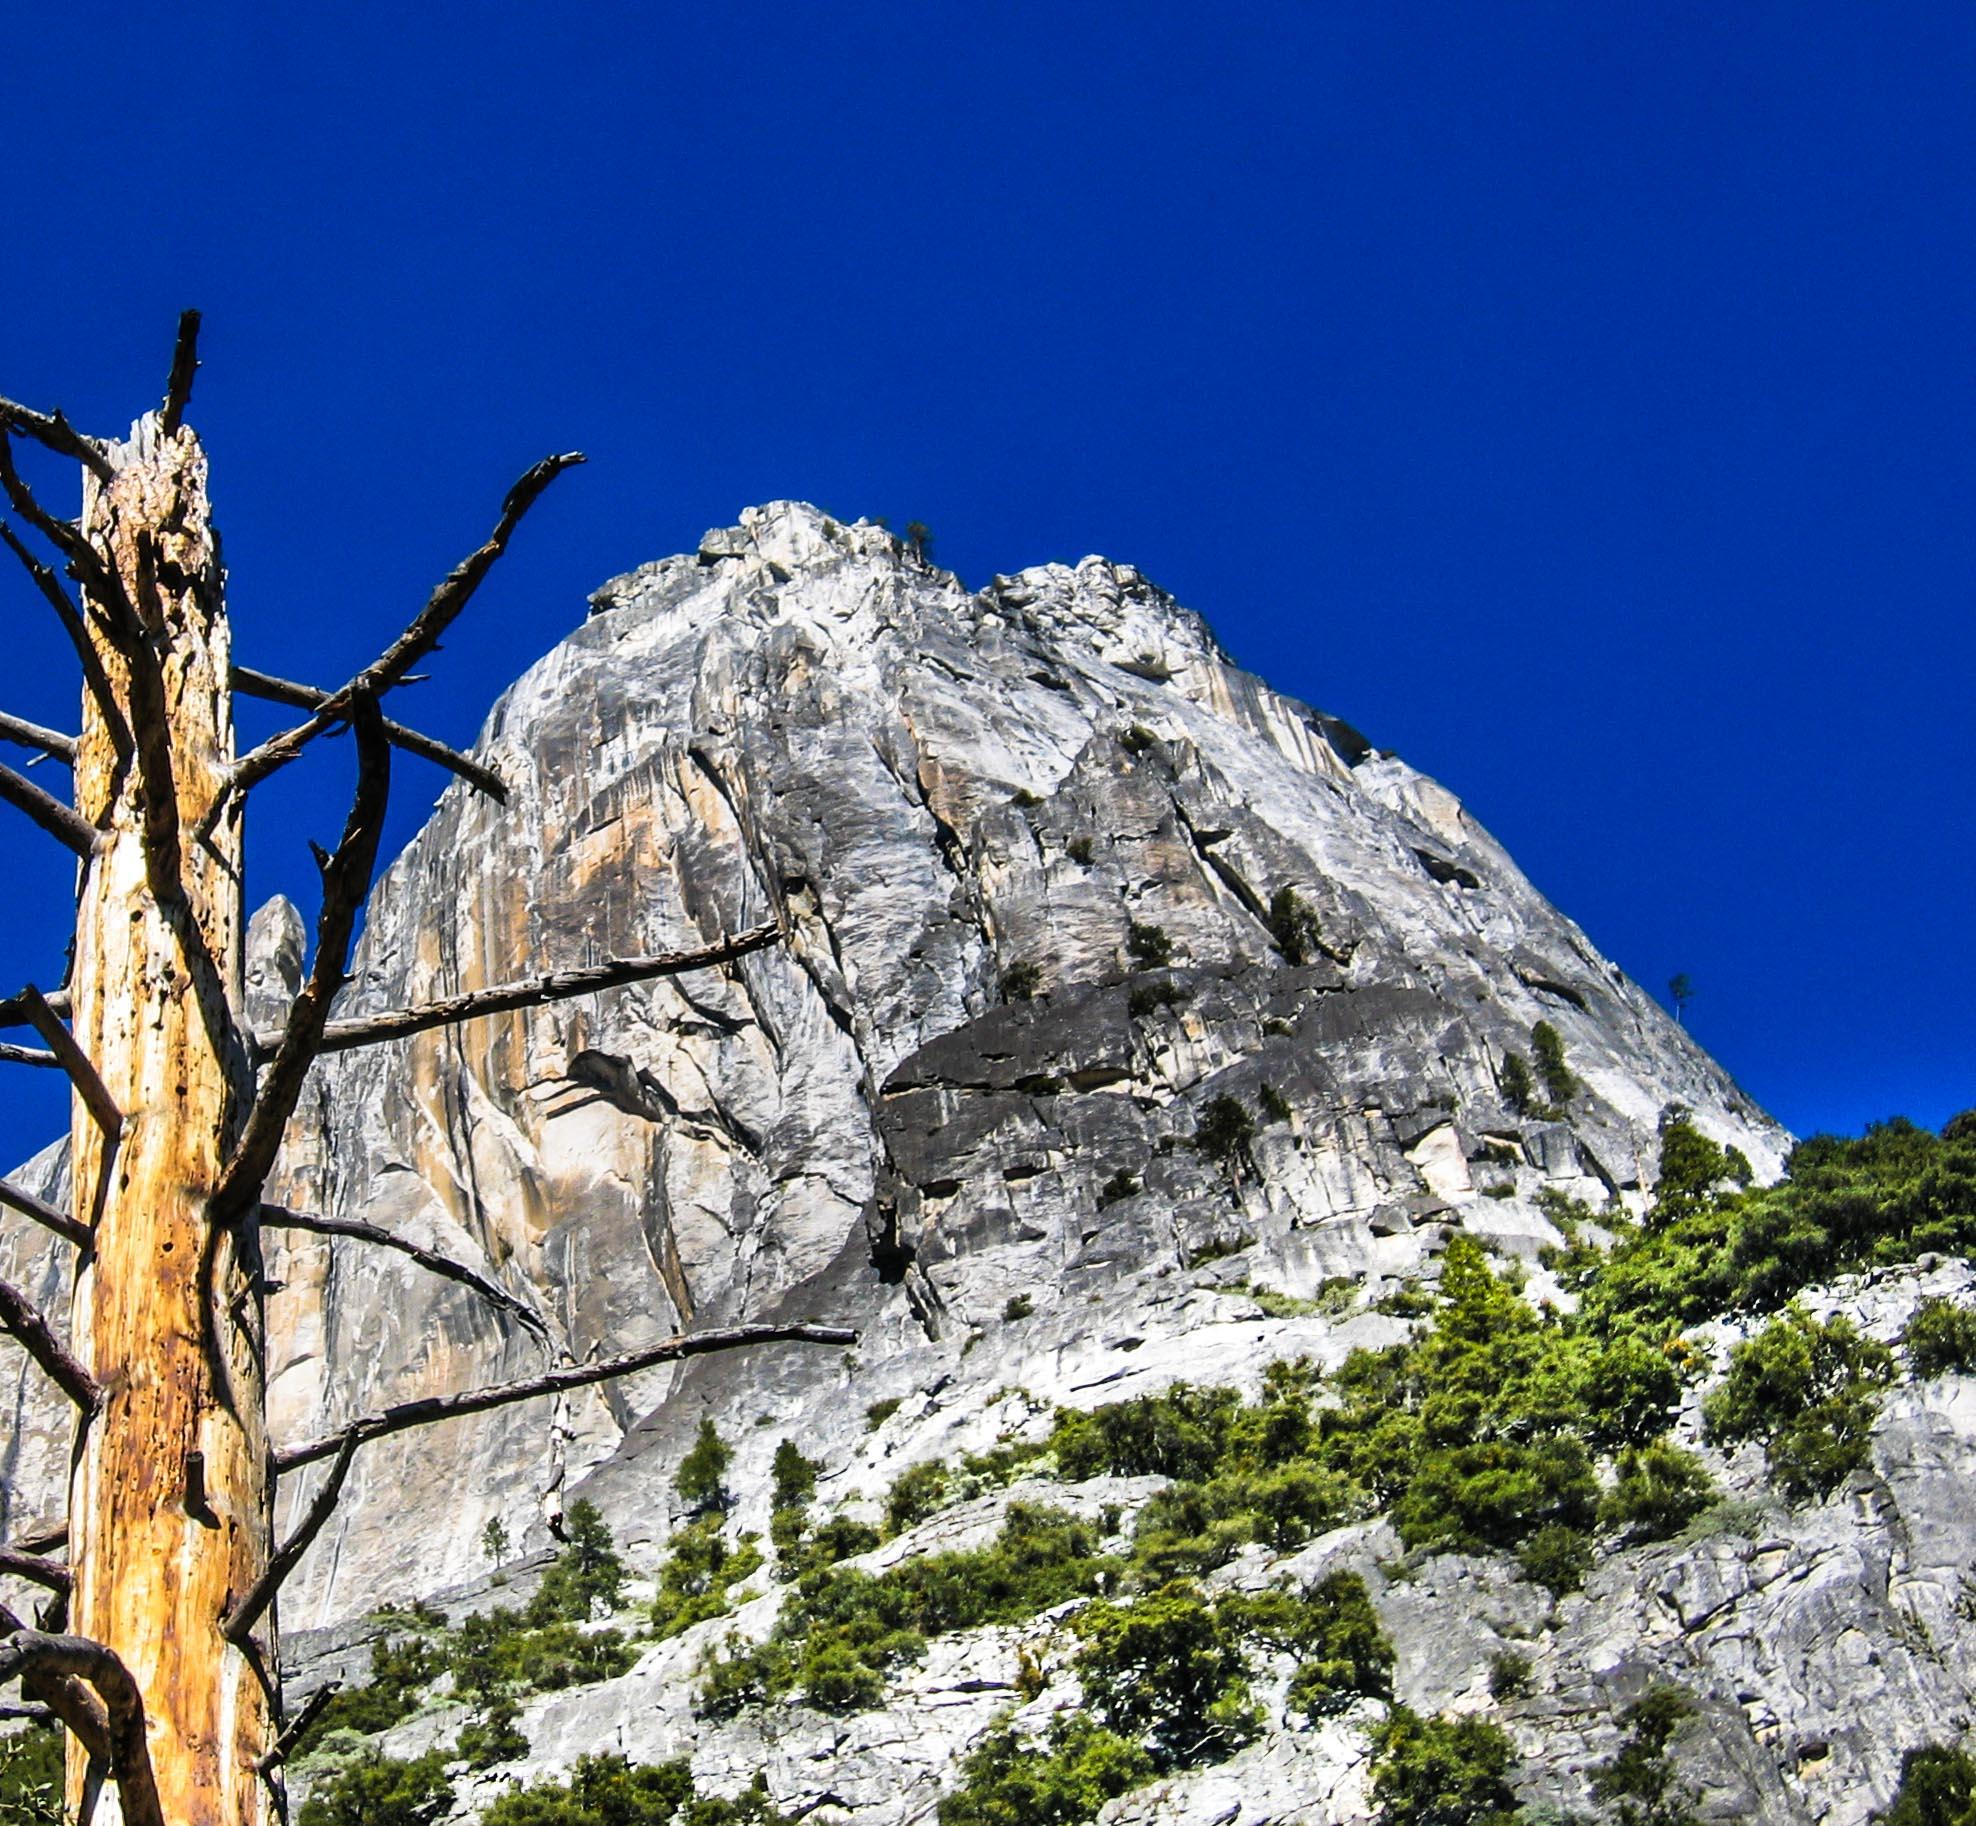 Yosemite in Winter, Yosemite National Park, California